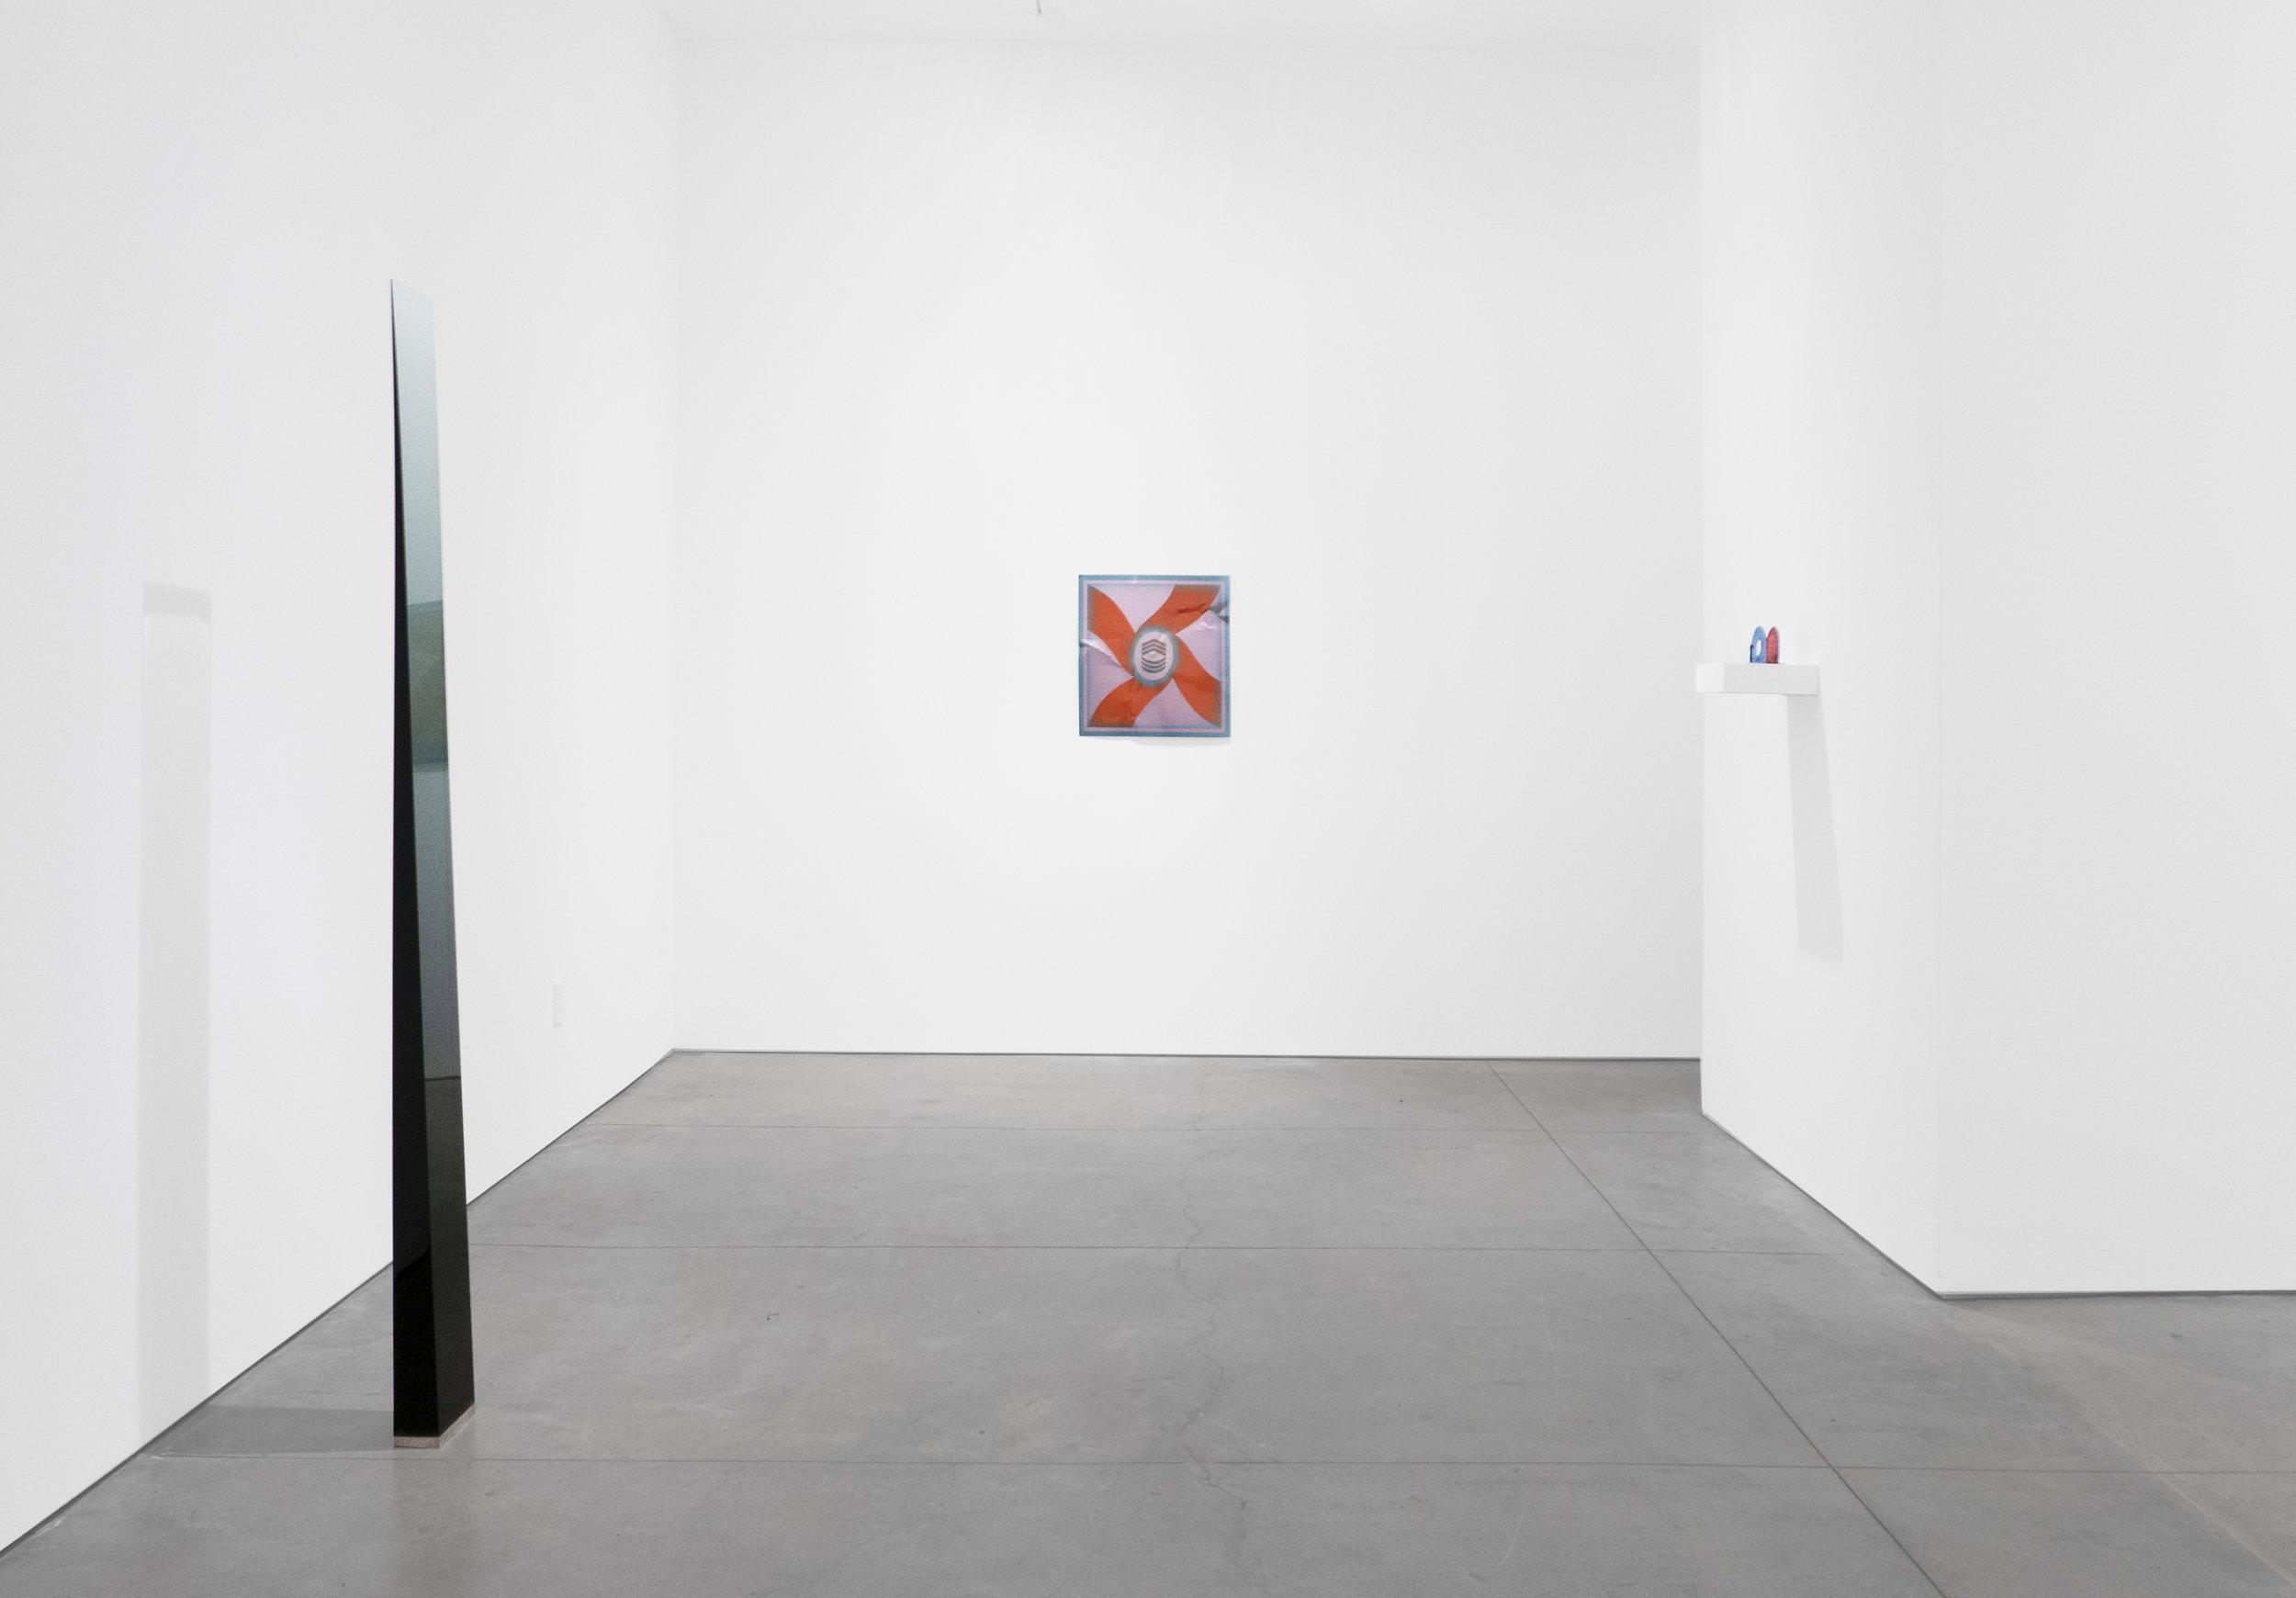 25 Years_Peter Blake Gallery_2019_Installation View_36.jpg